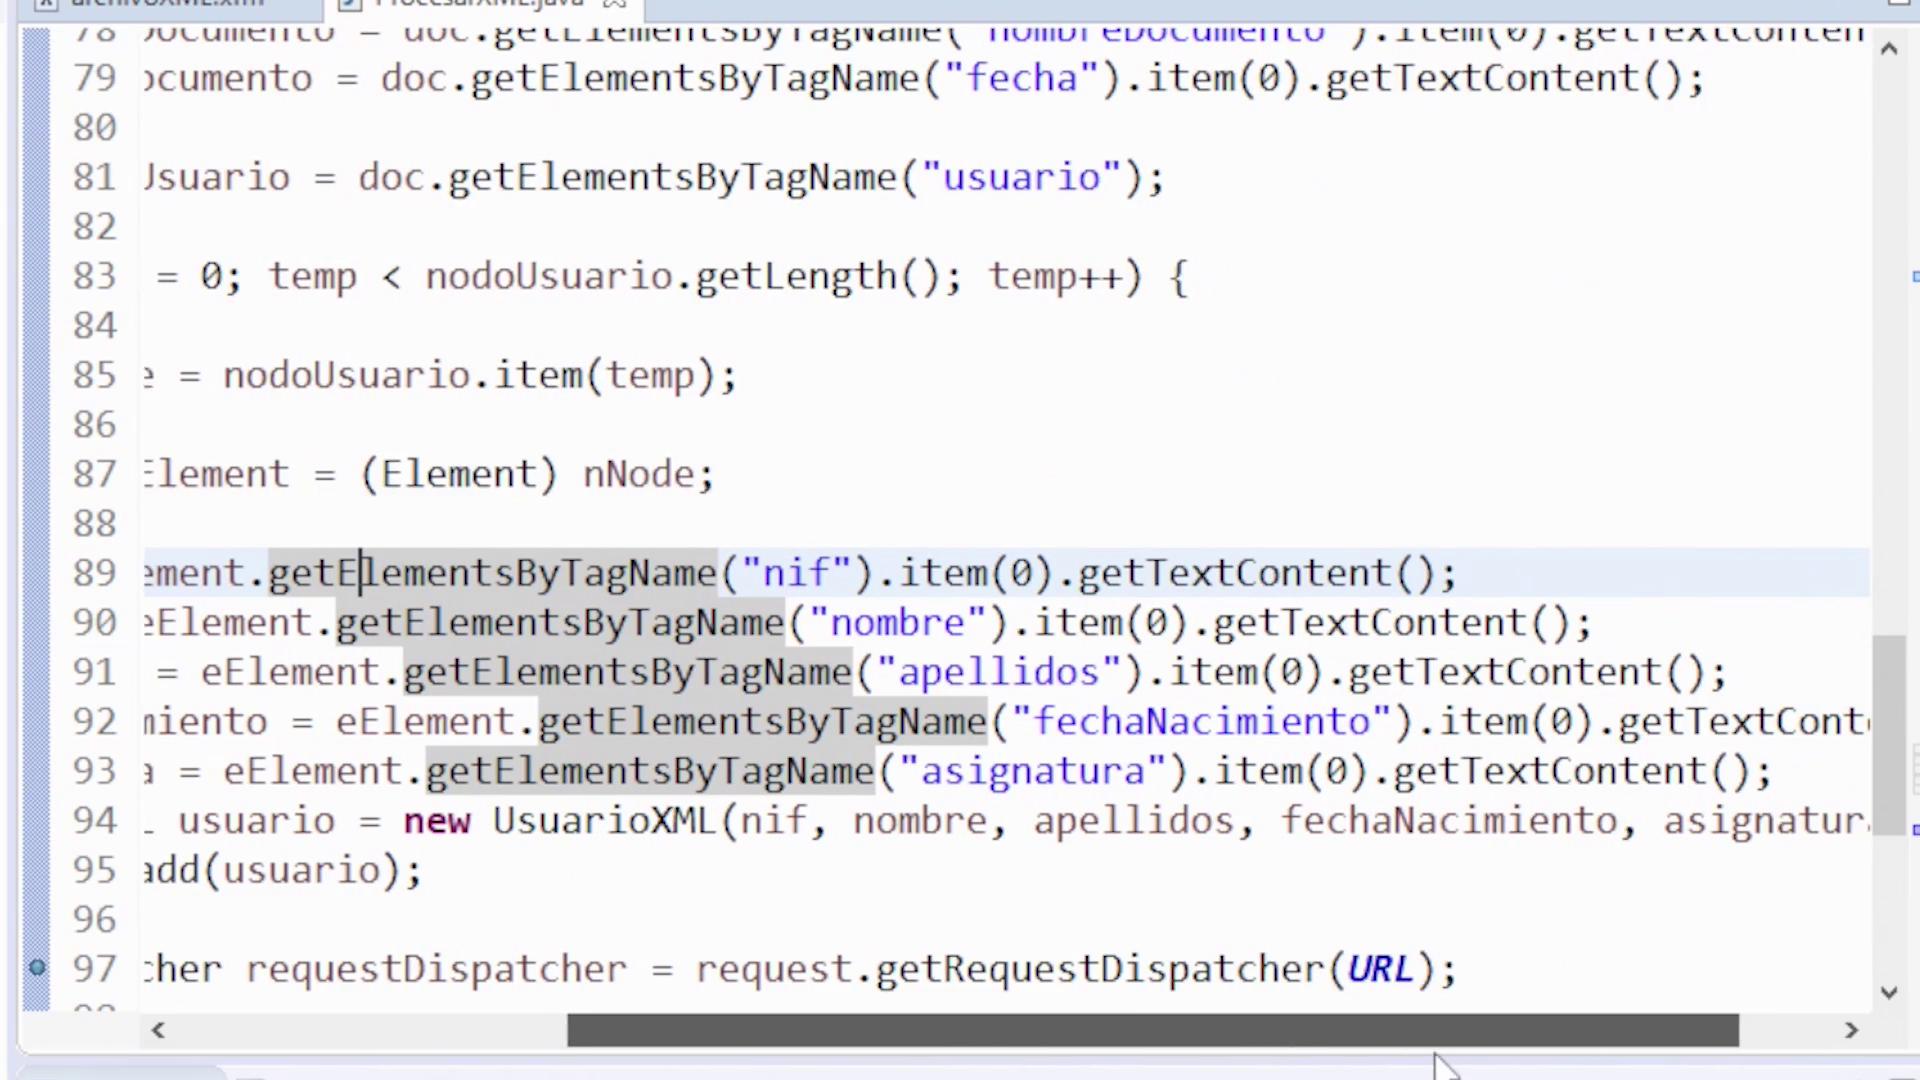 Imagen 4 en Cómo leer un fichero XML en Java